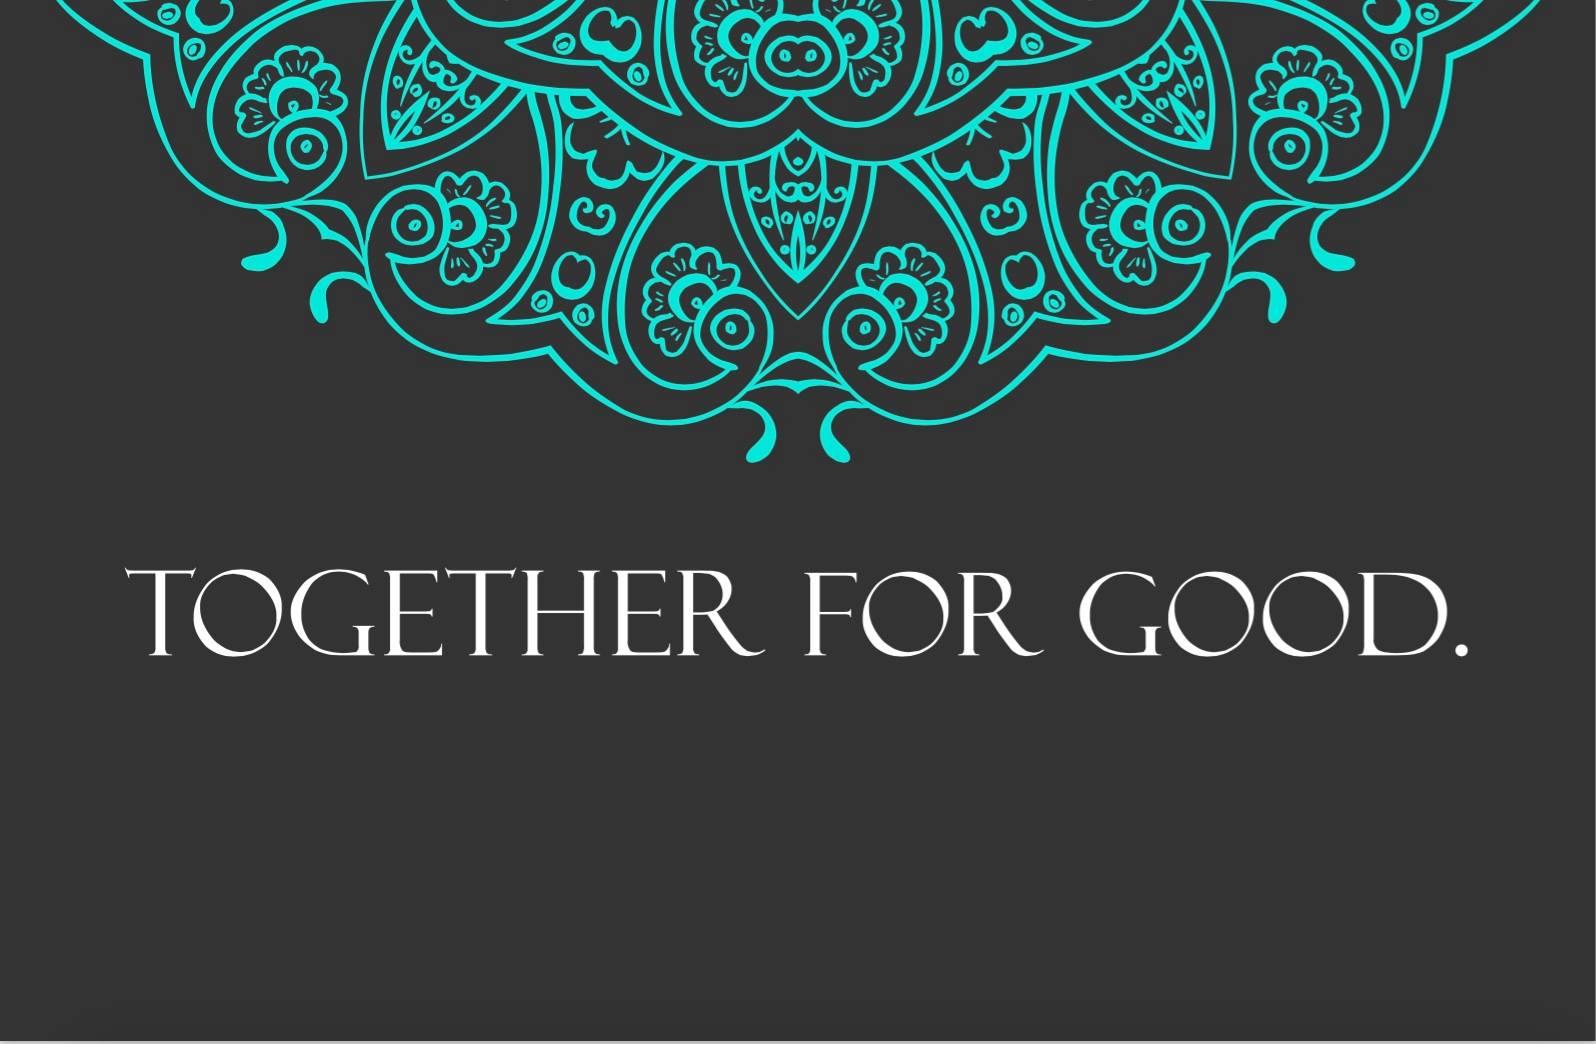 together for good